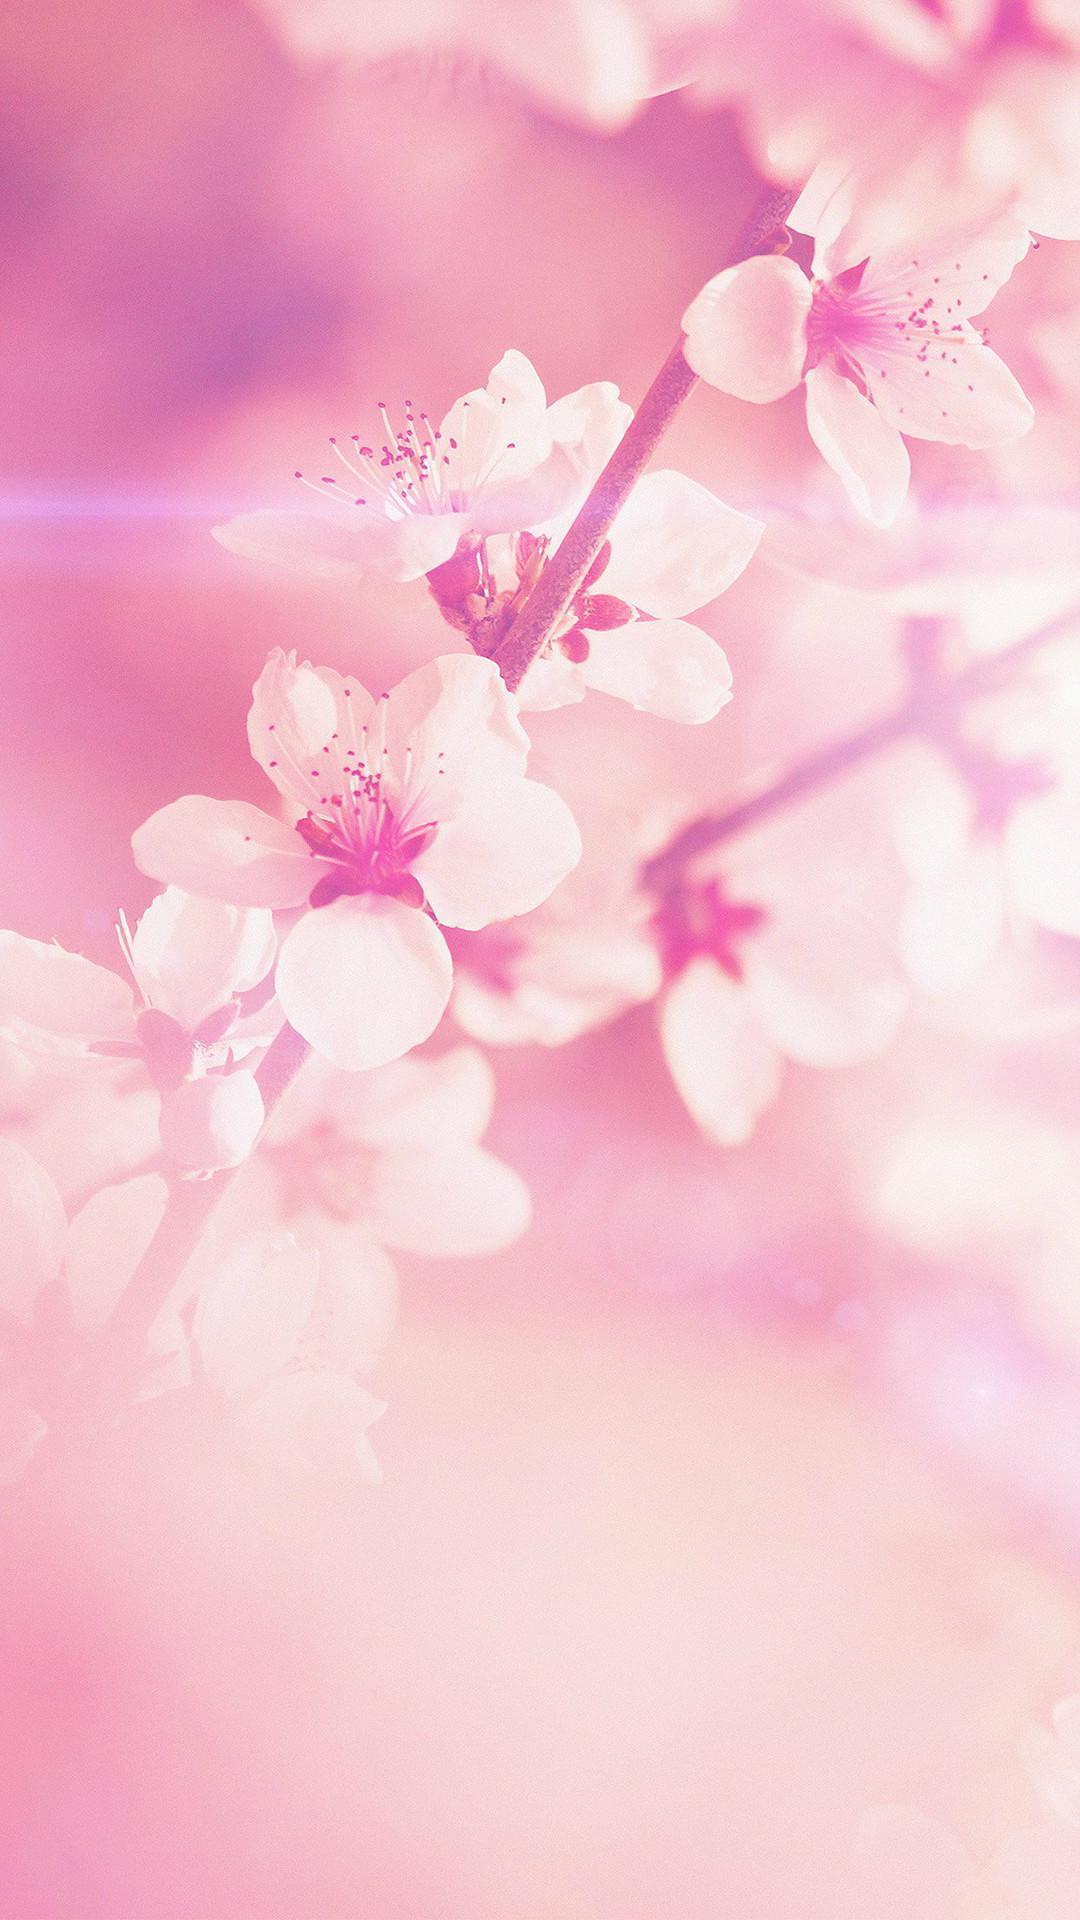 Explore Pink Wallpaper Iphone, Nature Wallpaper, and more!